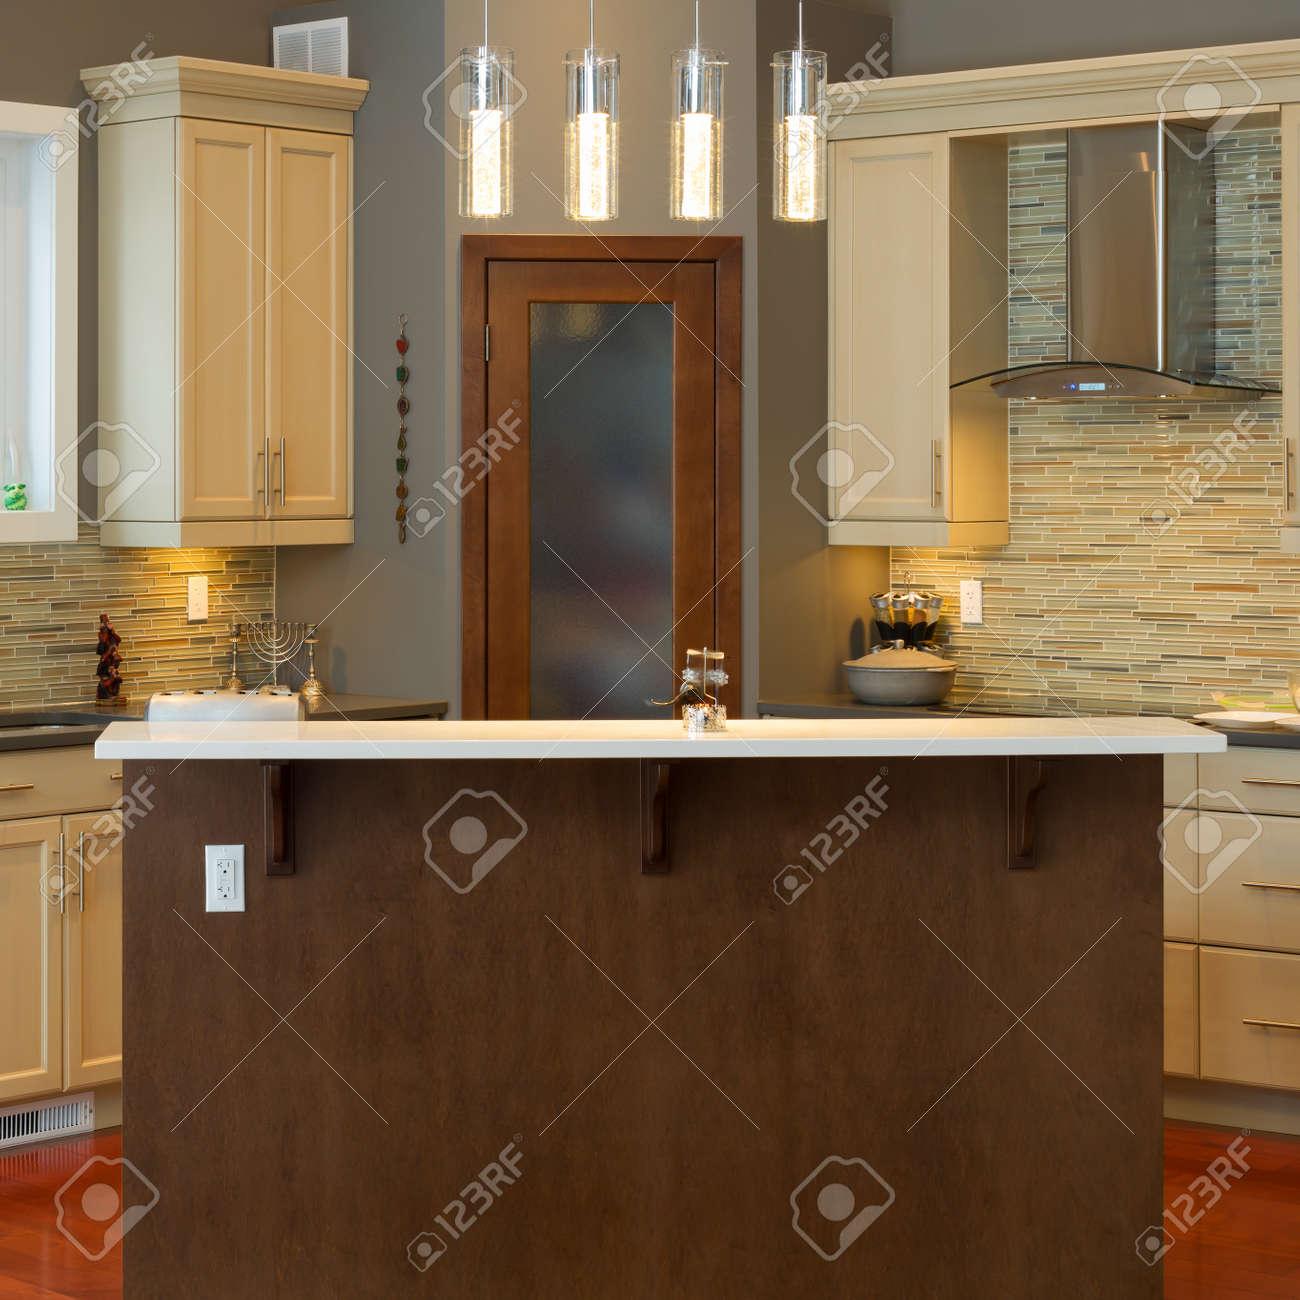 Modern kitchen Interior design  in a new house Stock Photo - 17644789